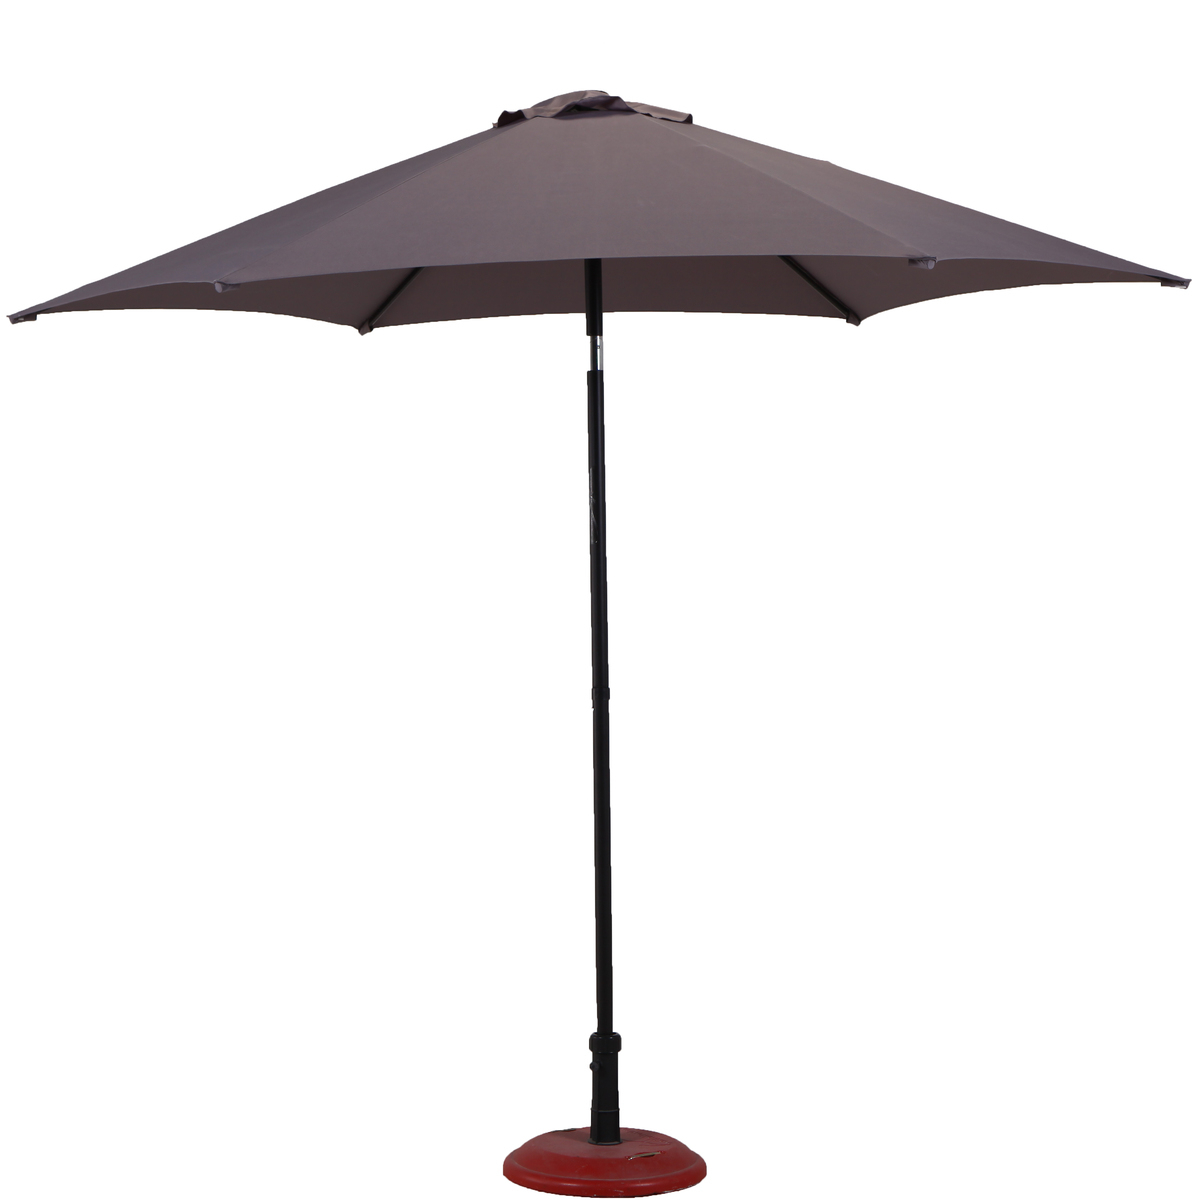 House & Home Market Umbrella  (View 10 of 20)